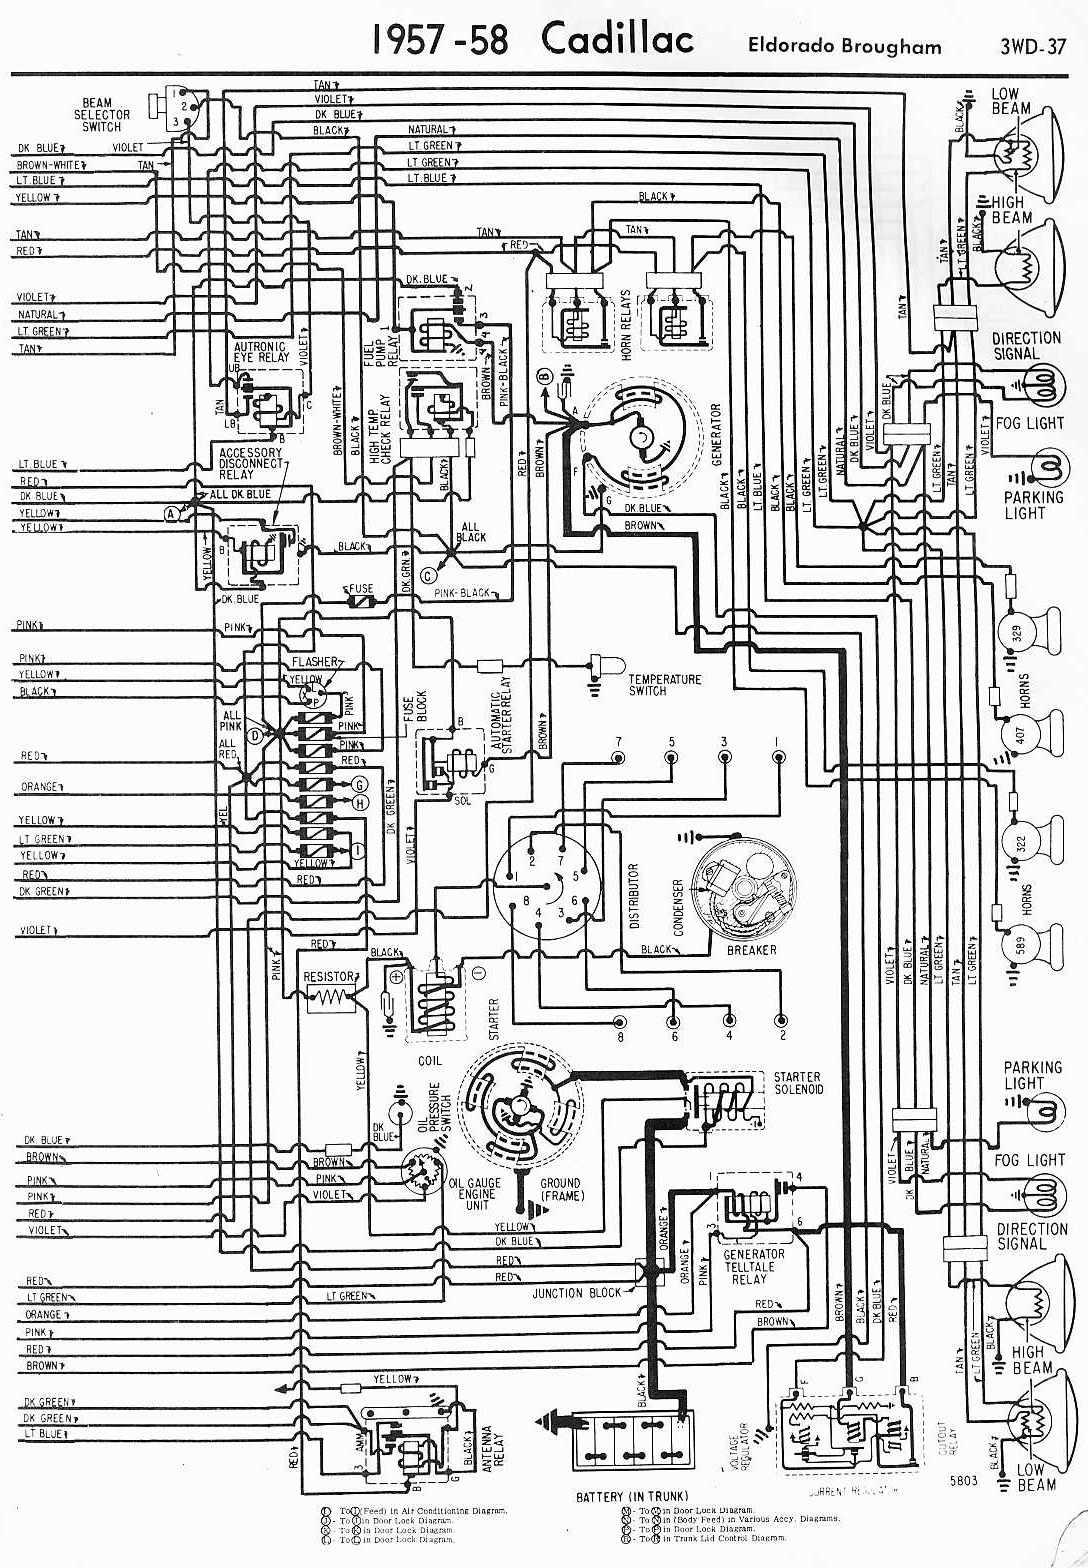 wiring diagram for 1992 cadillac fleetwood data wiring diagram site